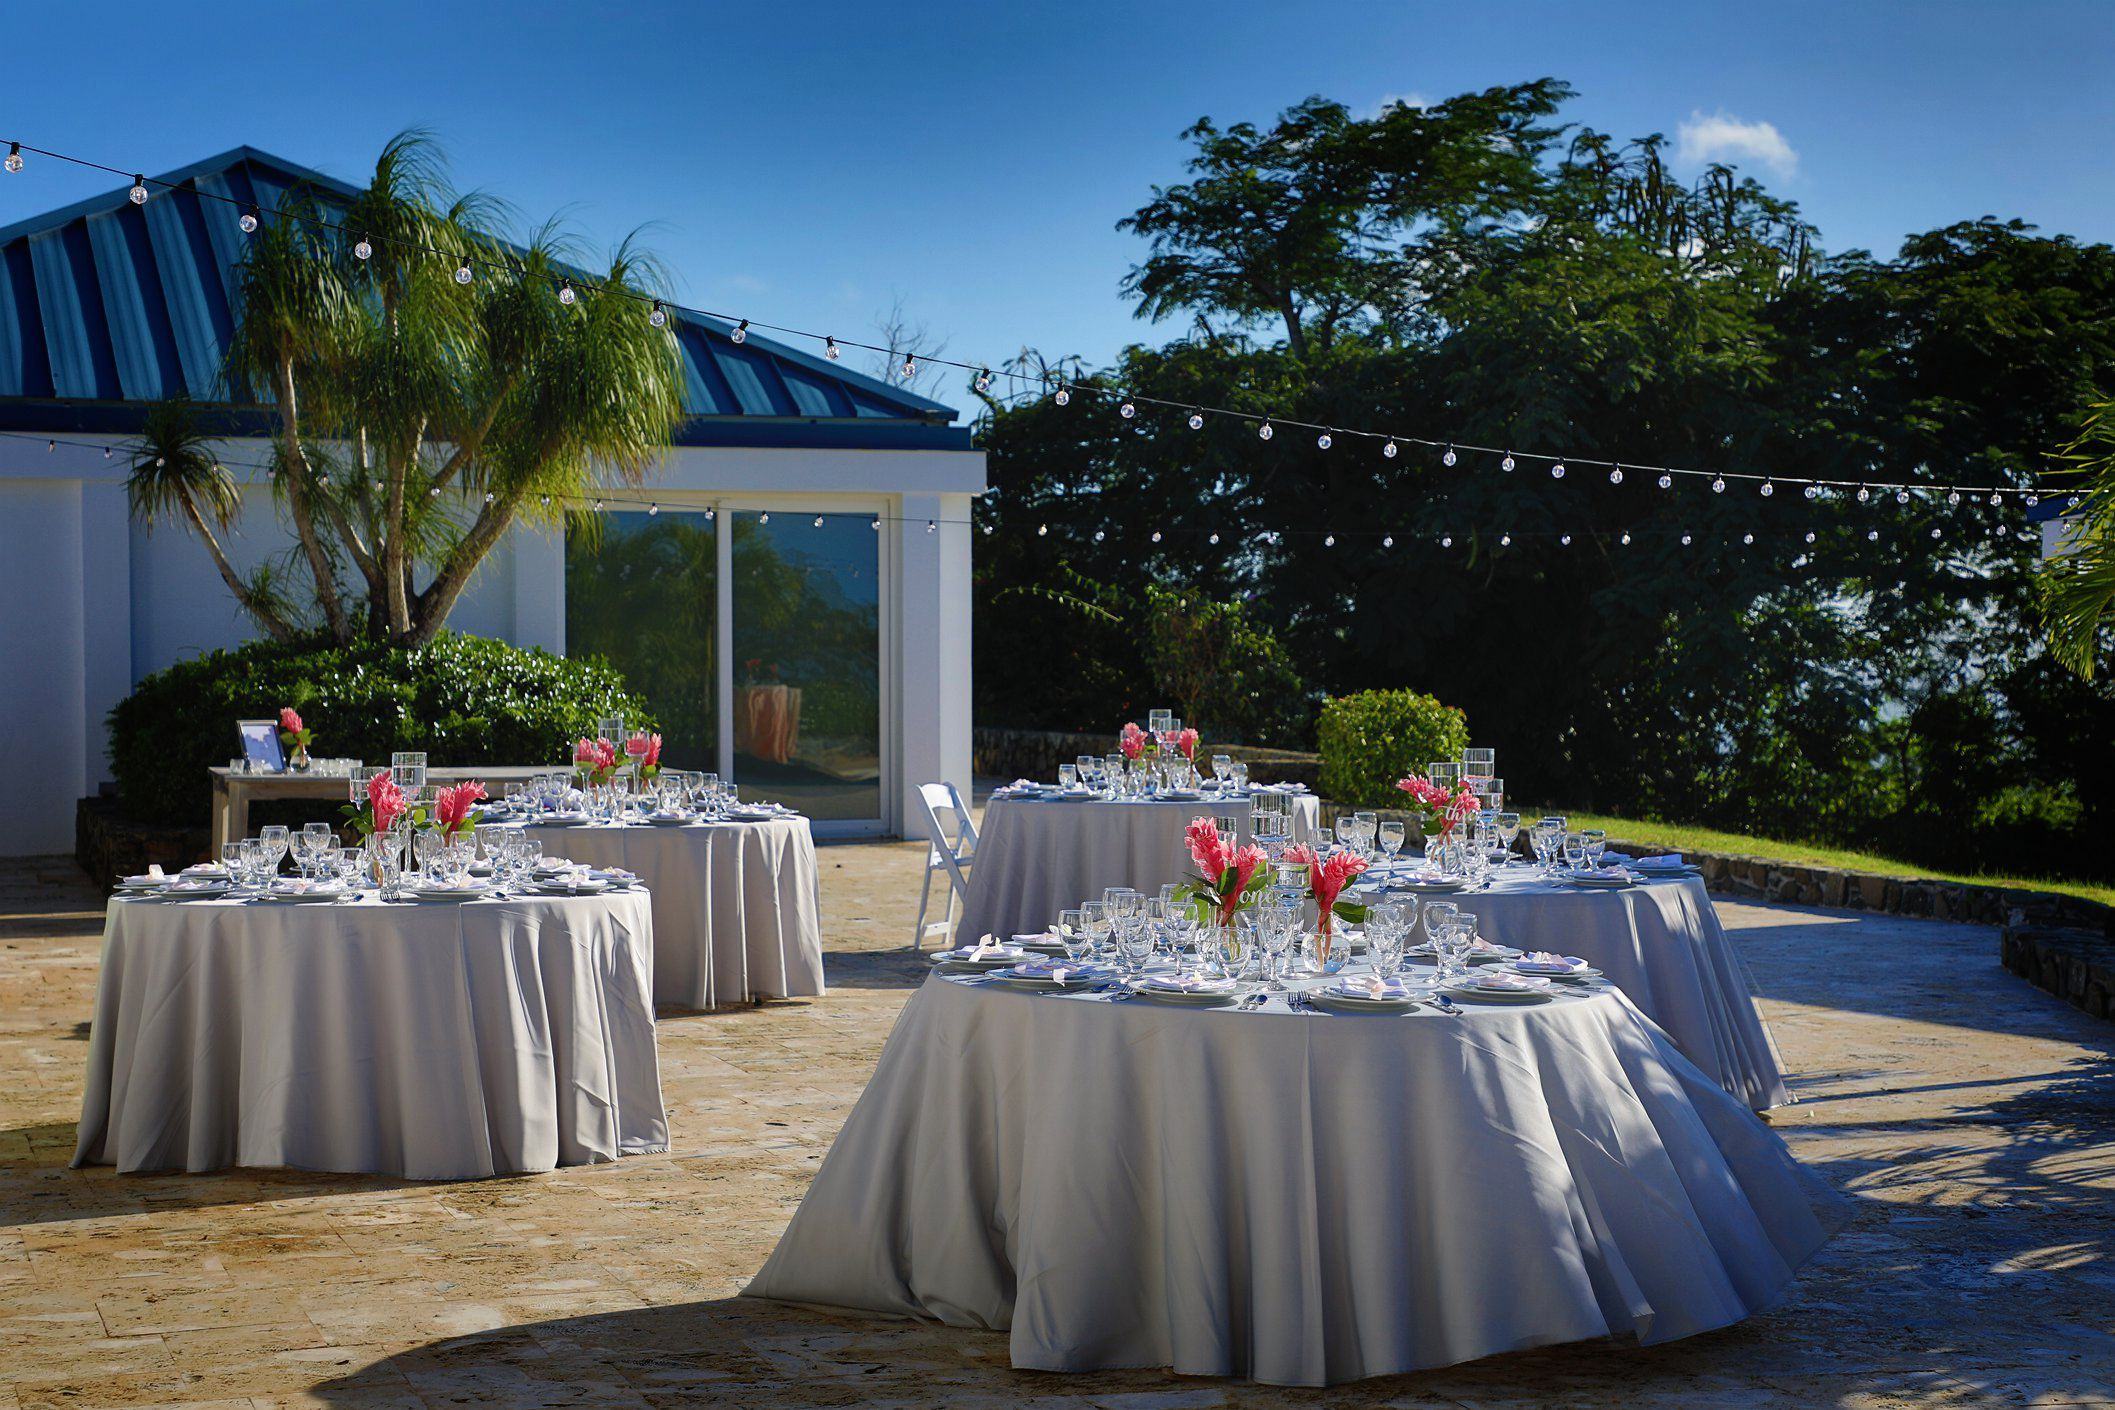 St Croix's Venue Series Clairmont Overlook (With images